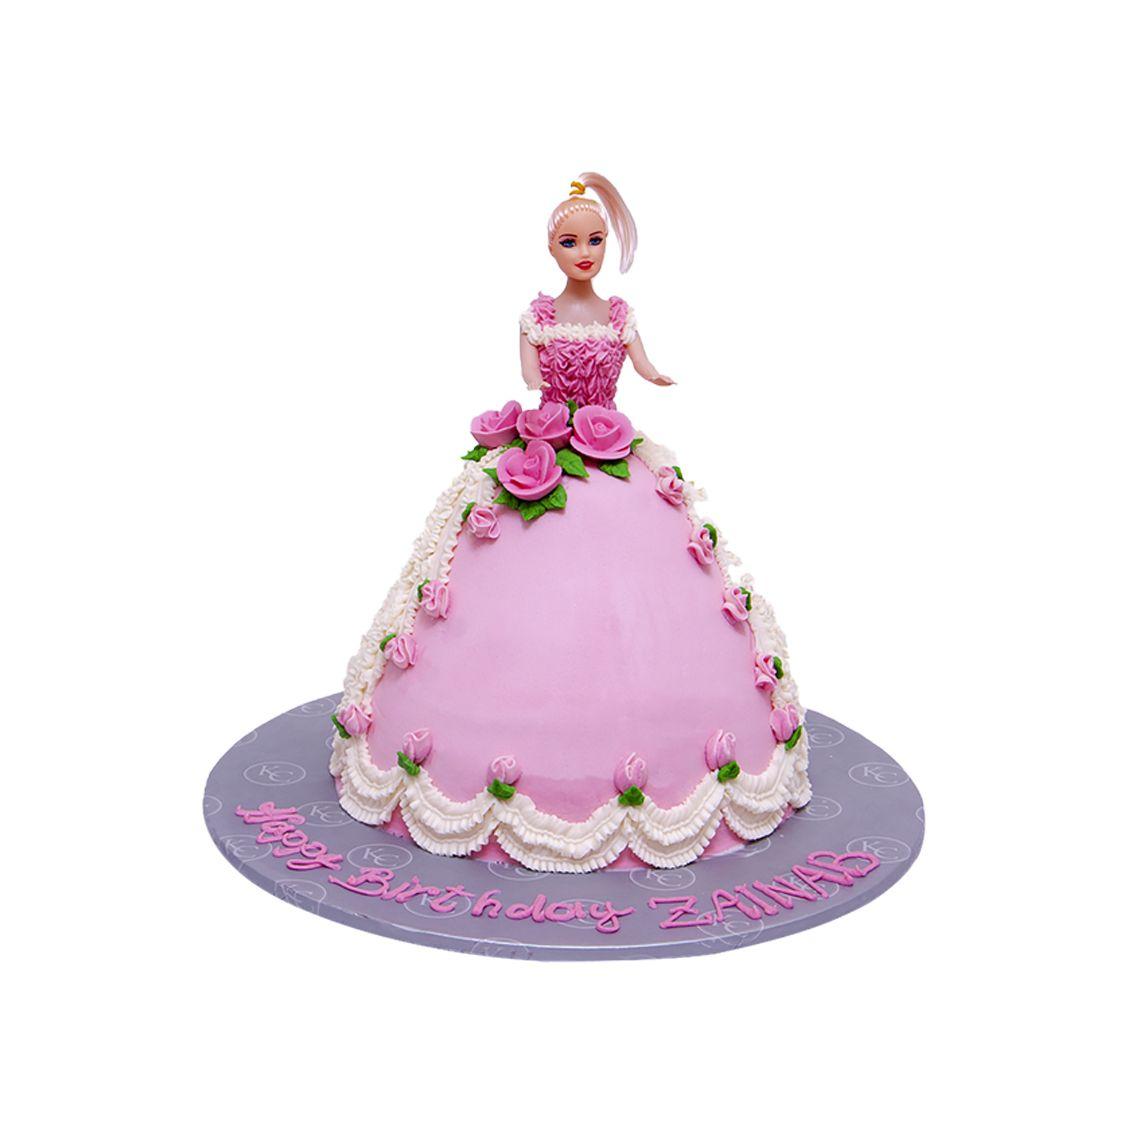 Kitchen Cuisine Default Category Doll Cake